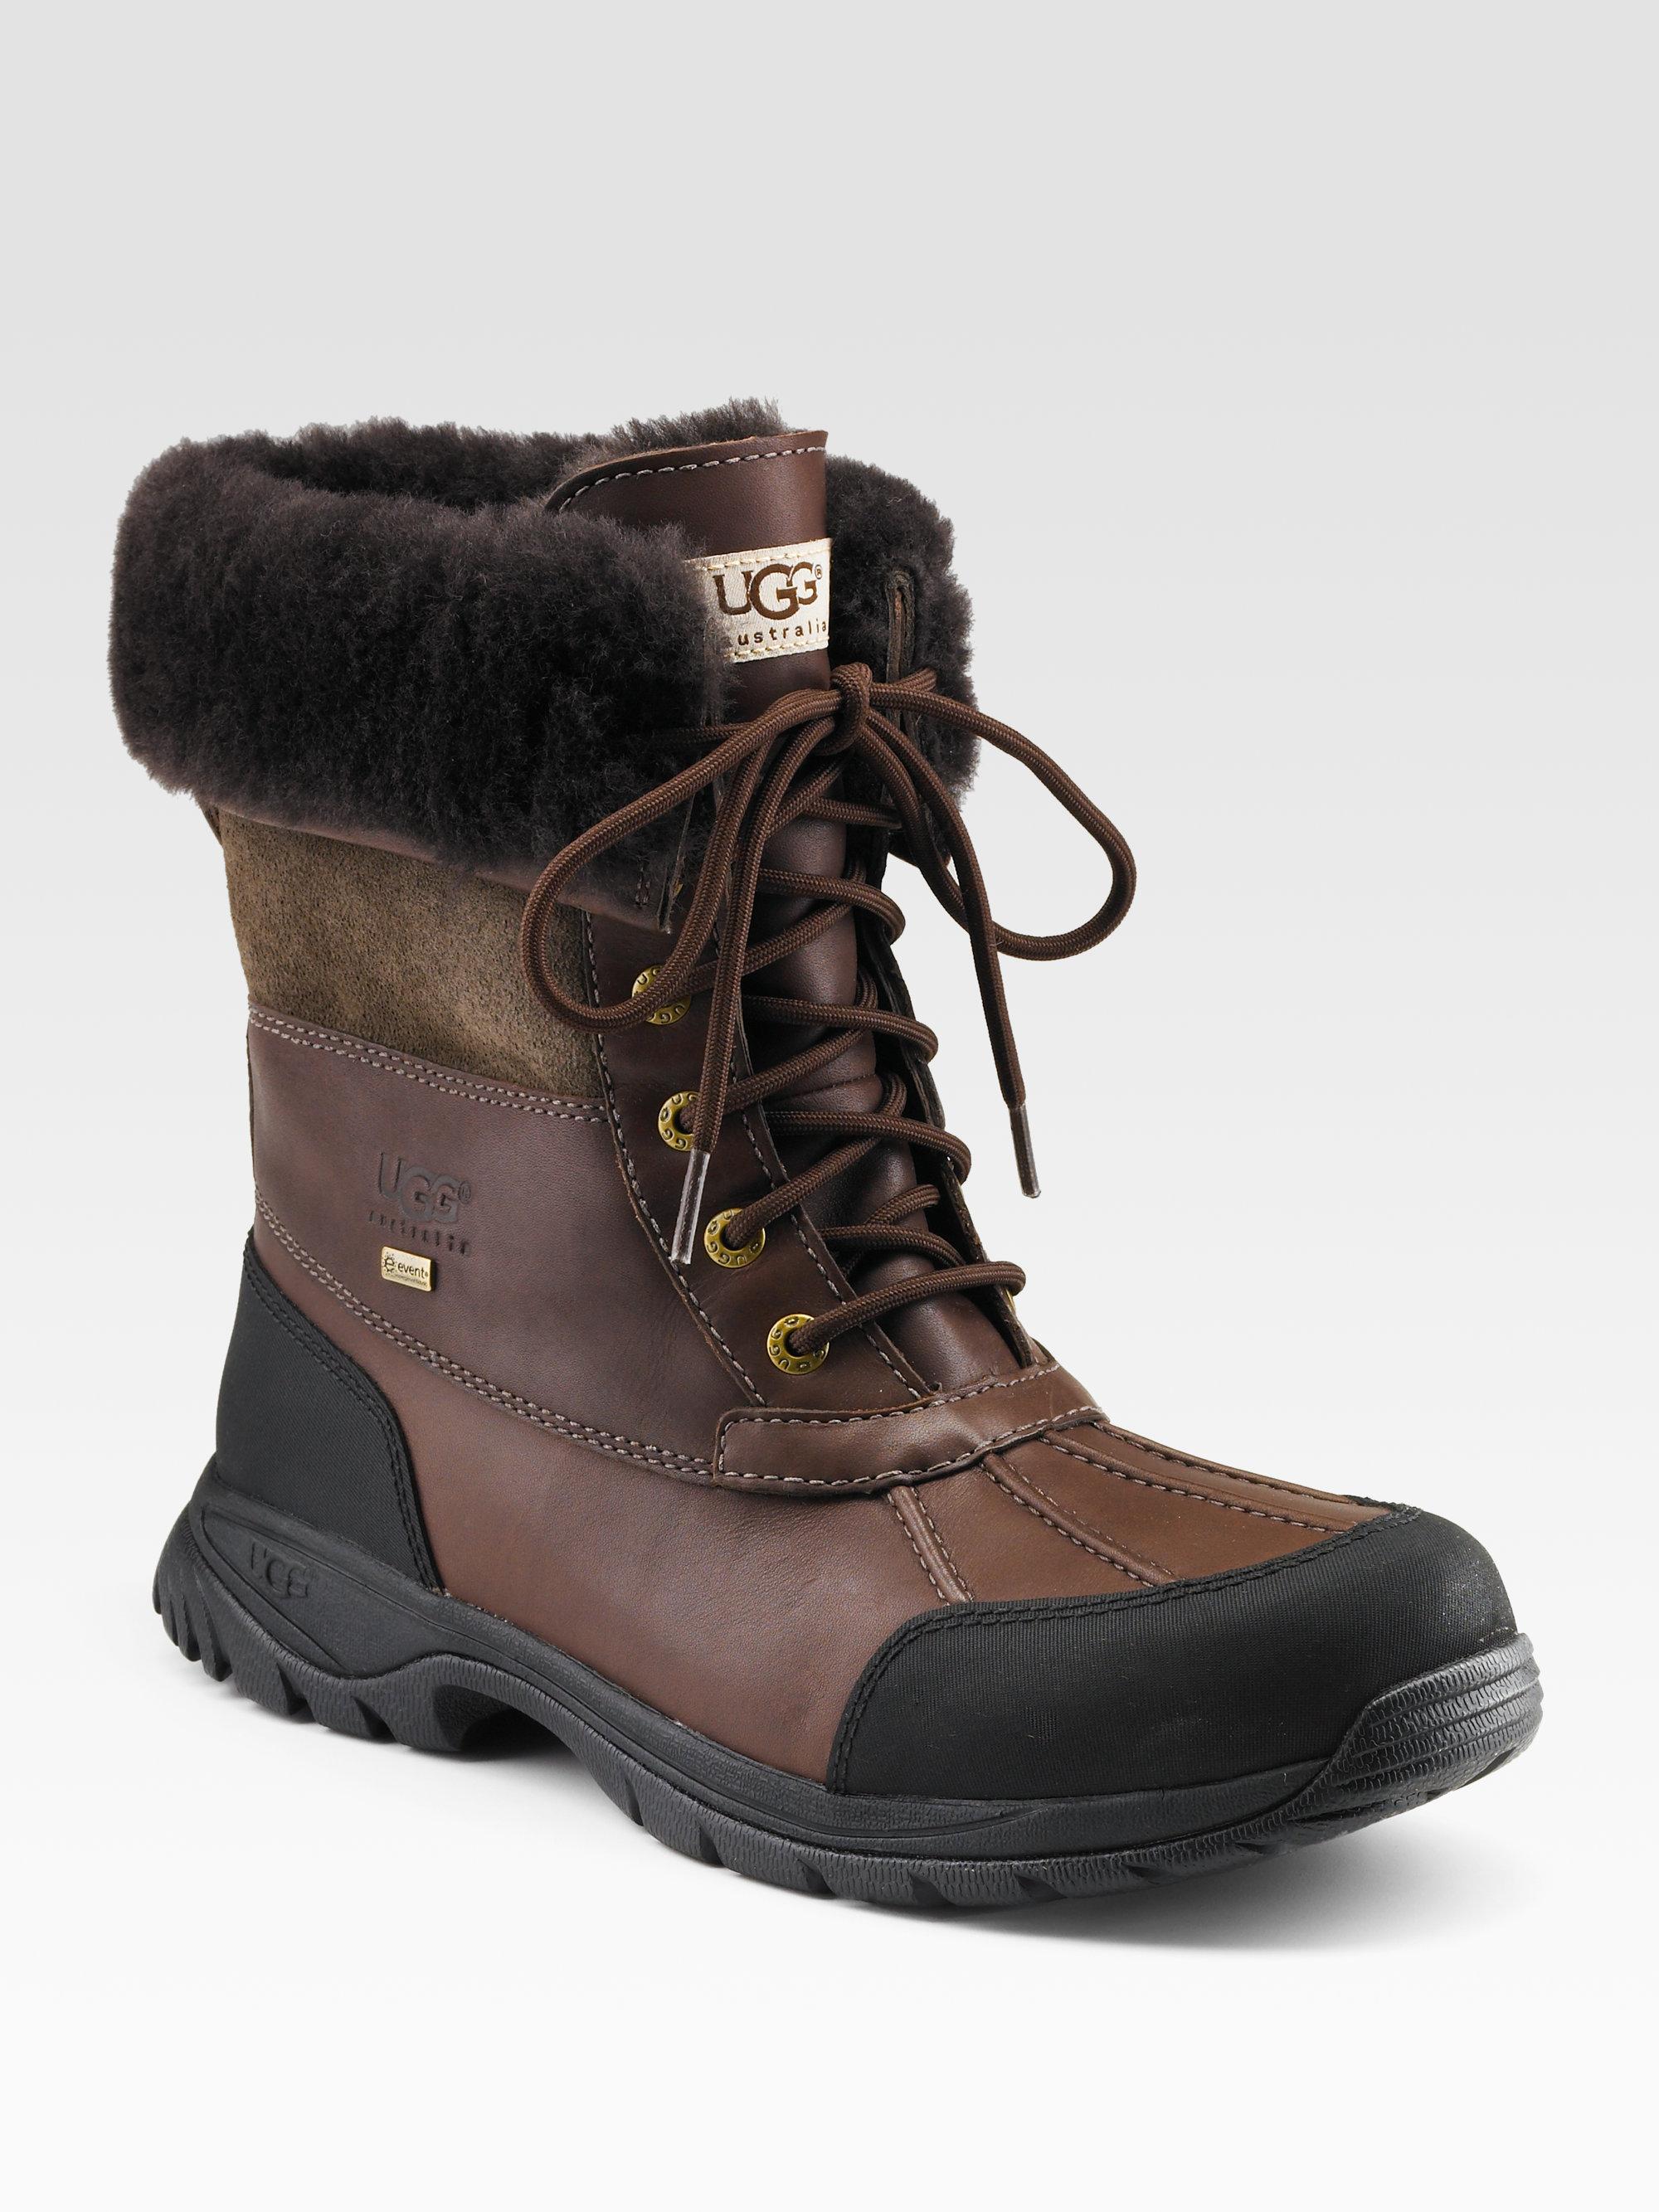 4e5fb862e53 where to buy male ugg boots 16f7c 03c3a